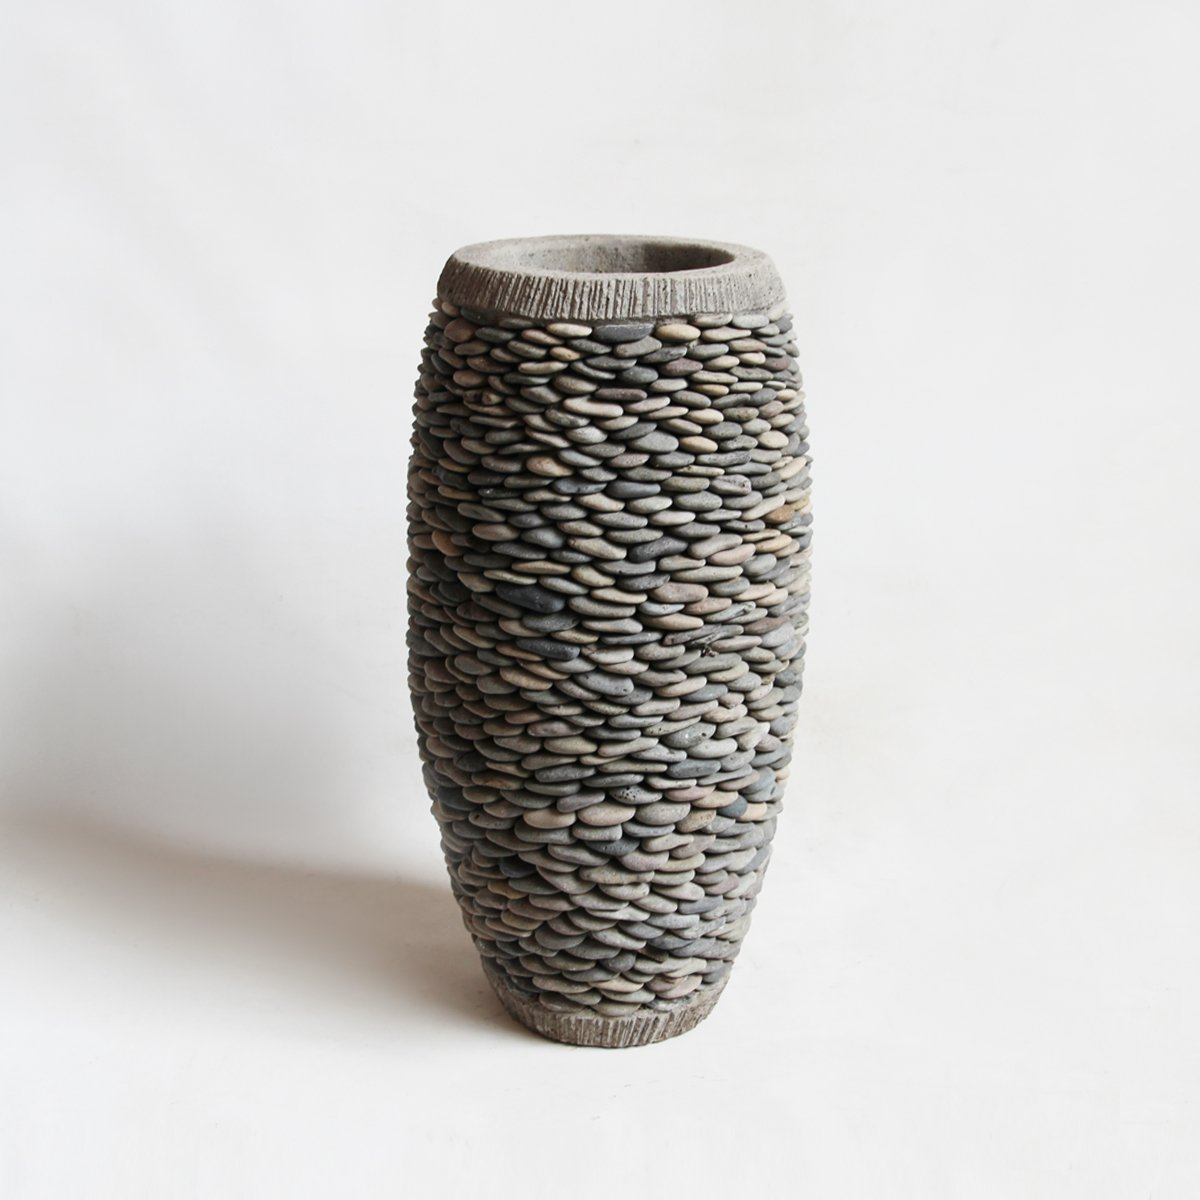 Bali Pebble Planter Small by Mix Furniture